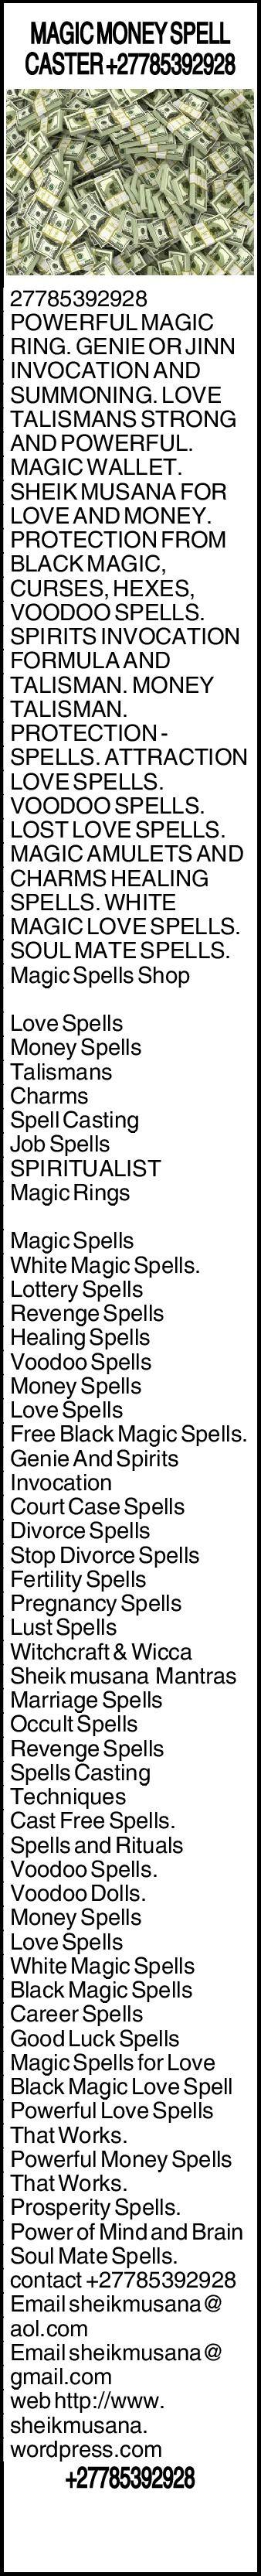 POWERFUL MAGIC MONEY SPELL CASTER +27785392928 (musananoah) on Pinterest